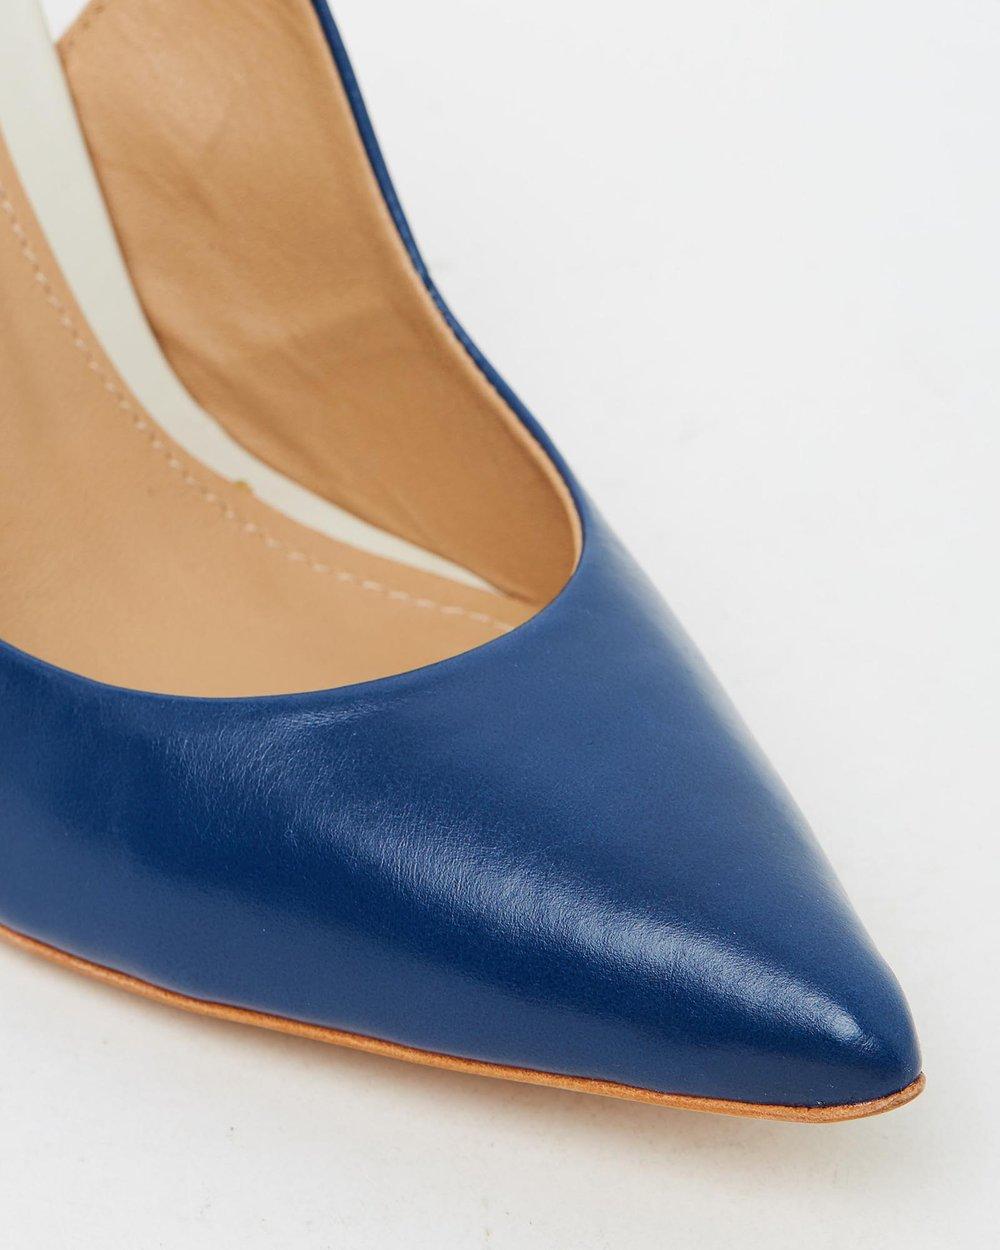 Farah - Royal Blue & Off-White